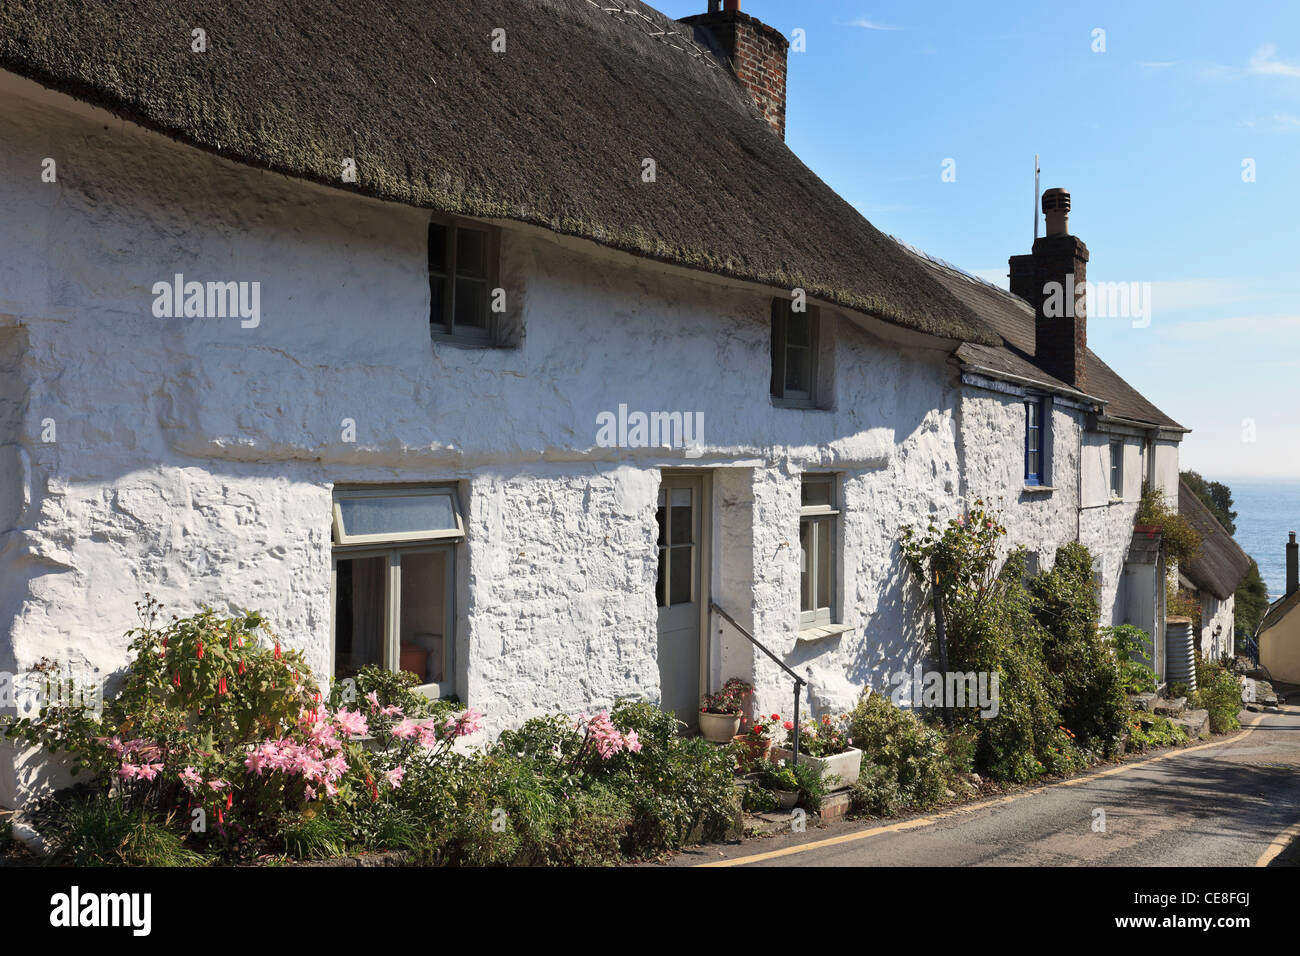 Cornish Cottages Stock Photos Amp Cornish Cottages Stock